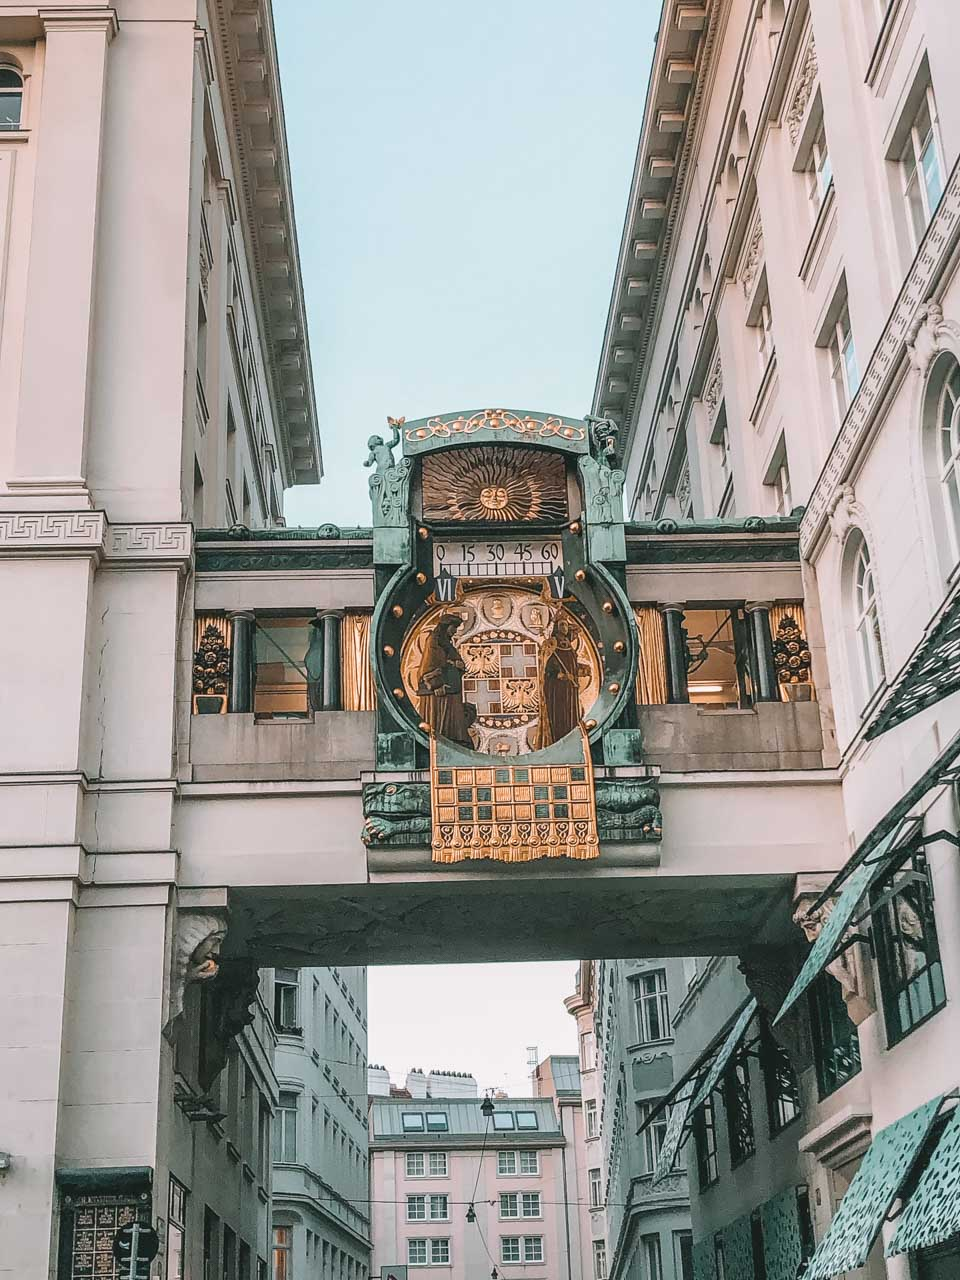 The Ankeruhr clock in Vienna, Austria